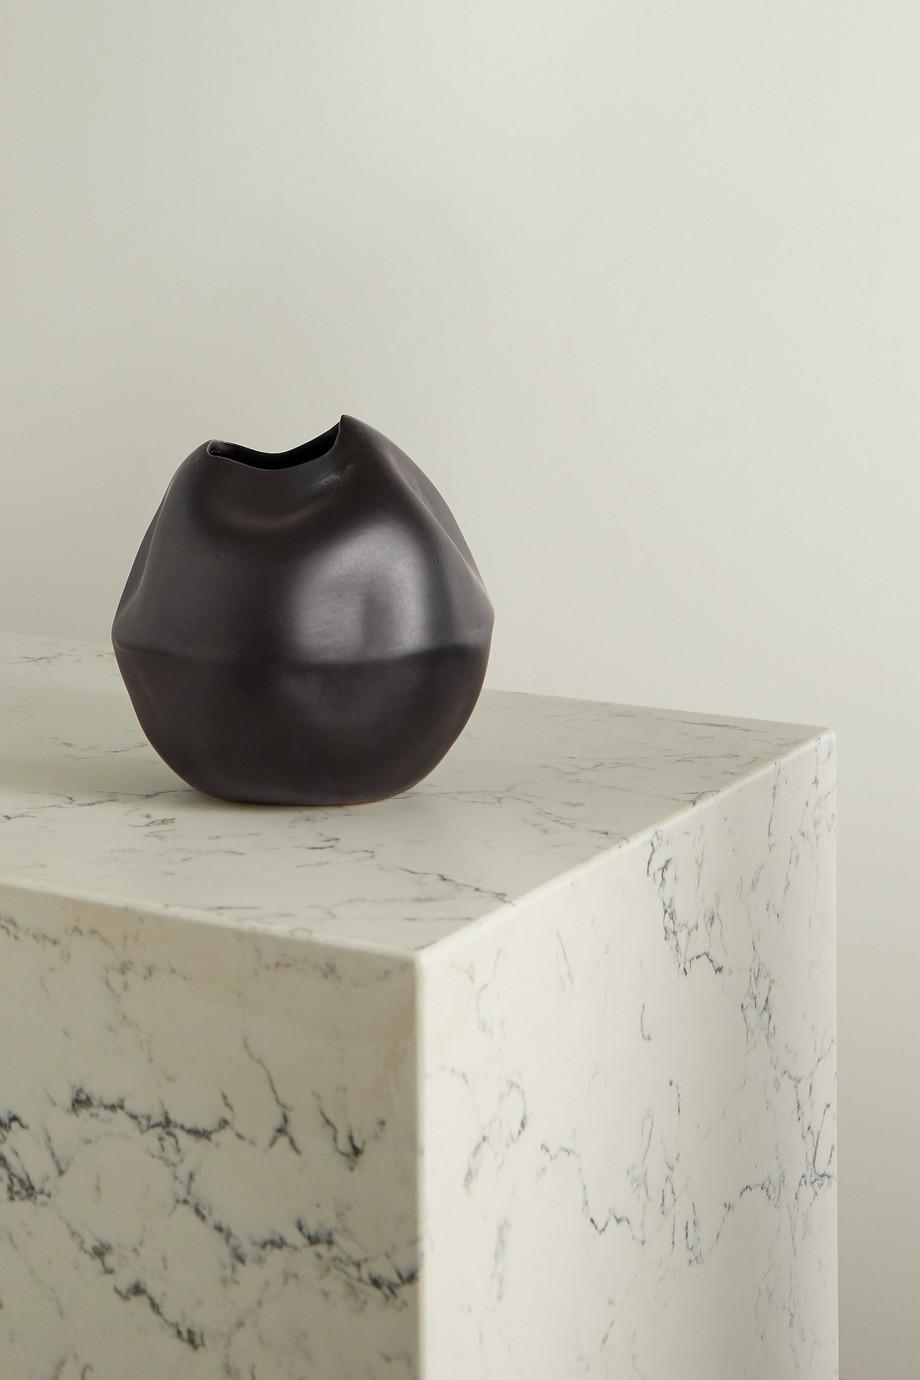 Completedworks + Ekaterina Bazhenova Yamasaki Banned Book No. 2 ceramic vase